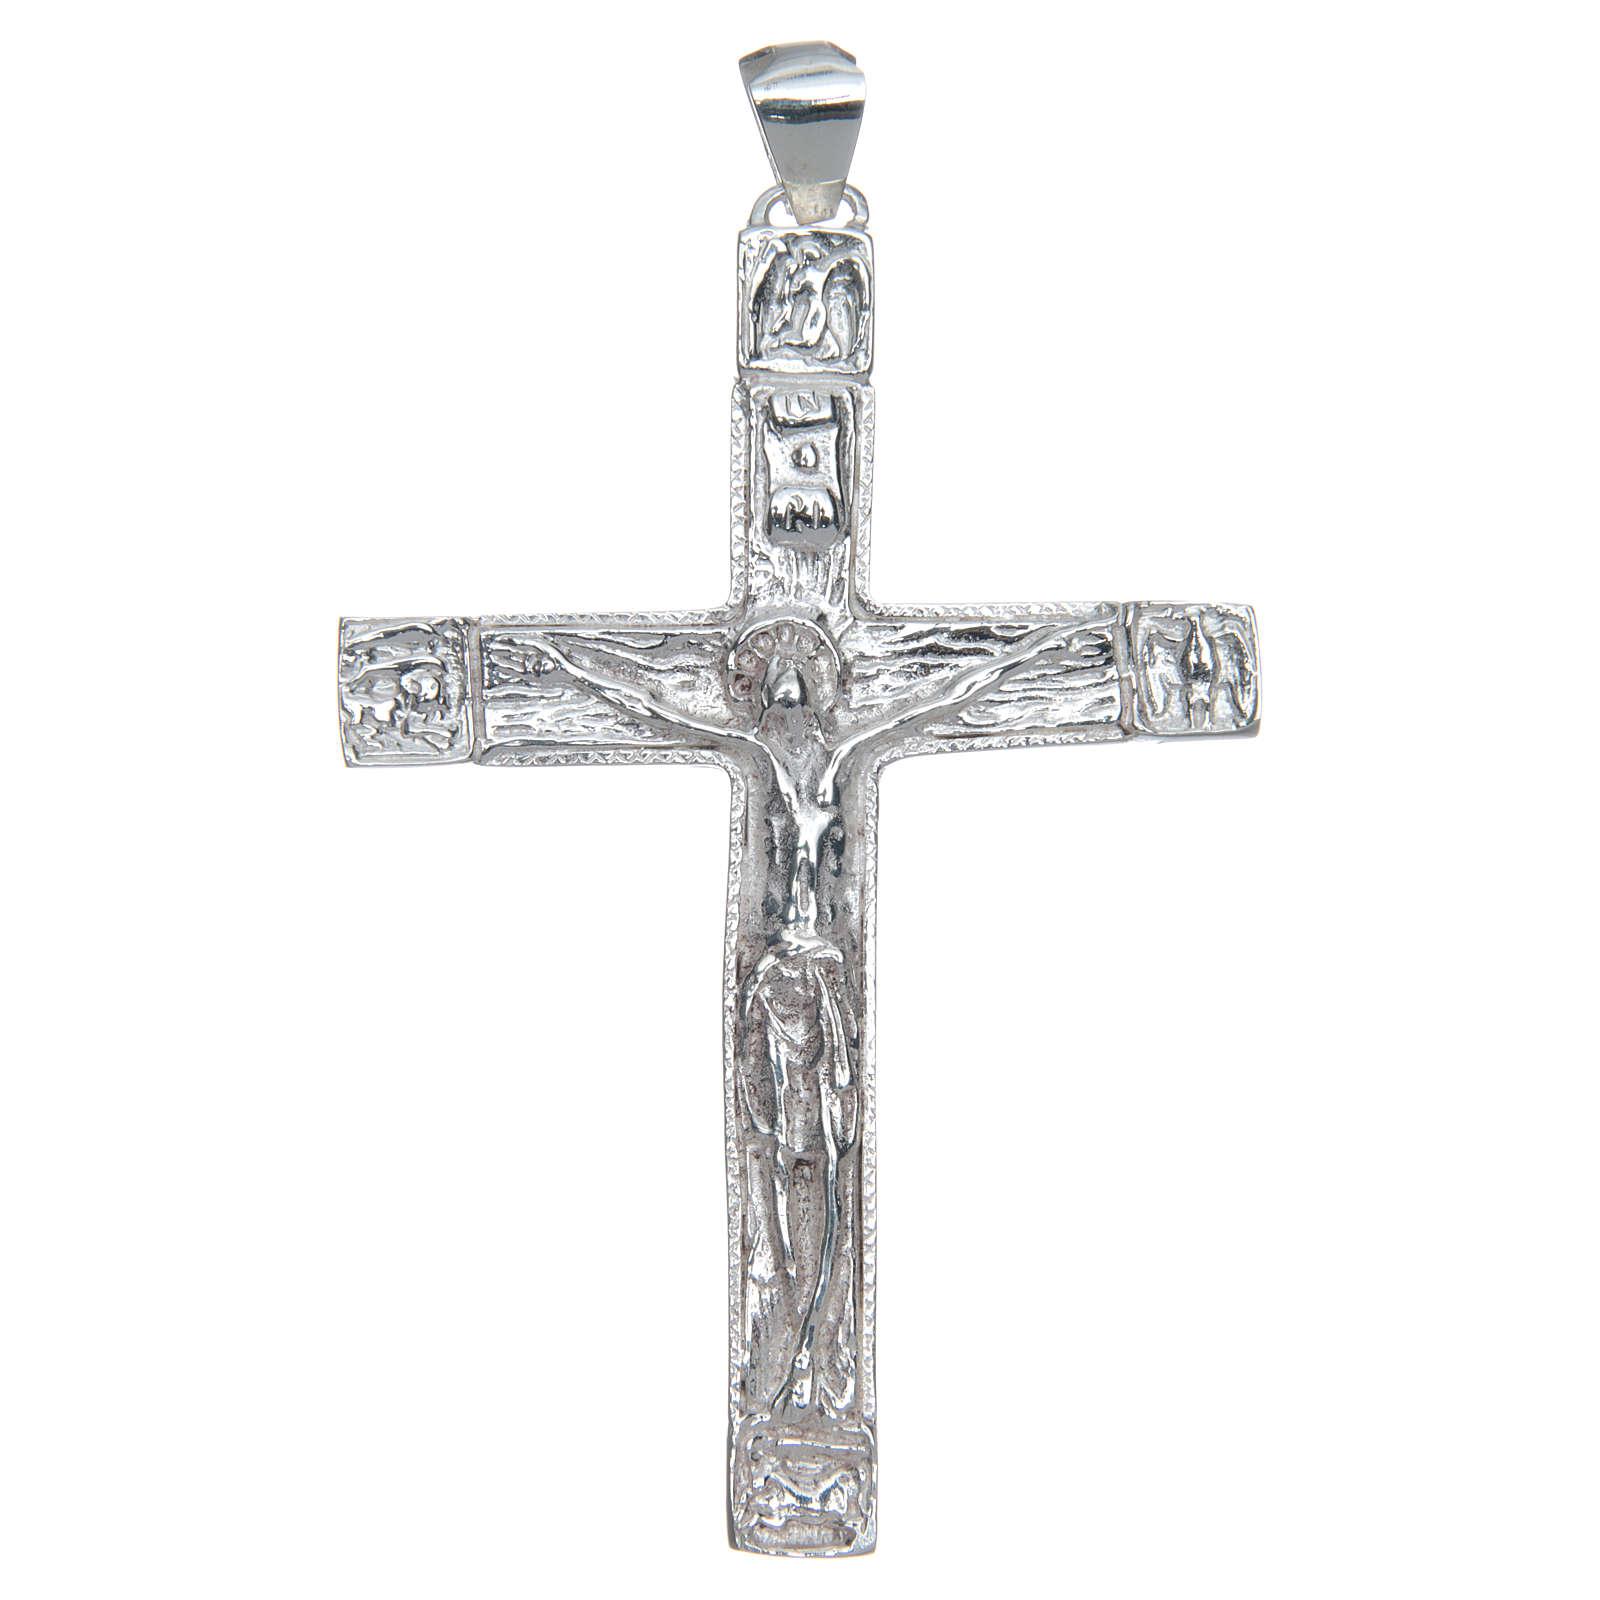 Croce pettorale Crocefisso Argento 925 3